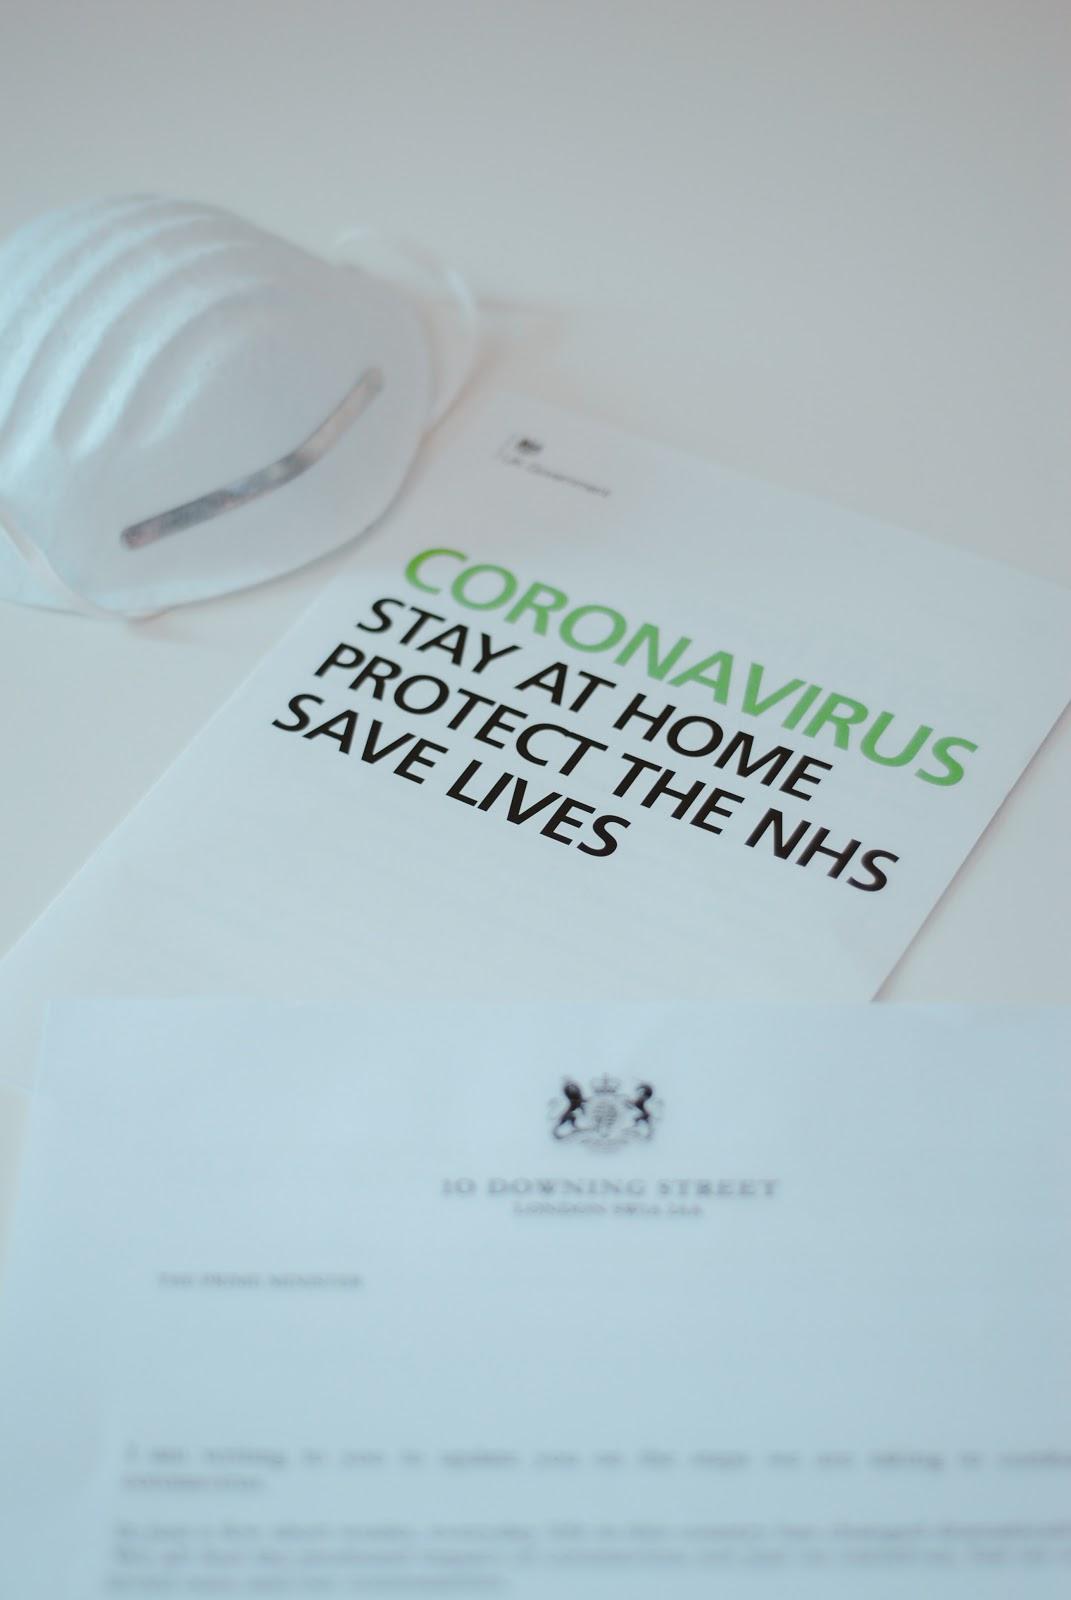 Coronarvirus, stay at home!